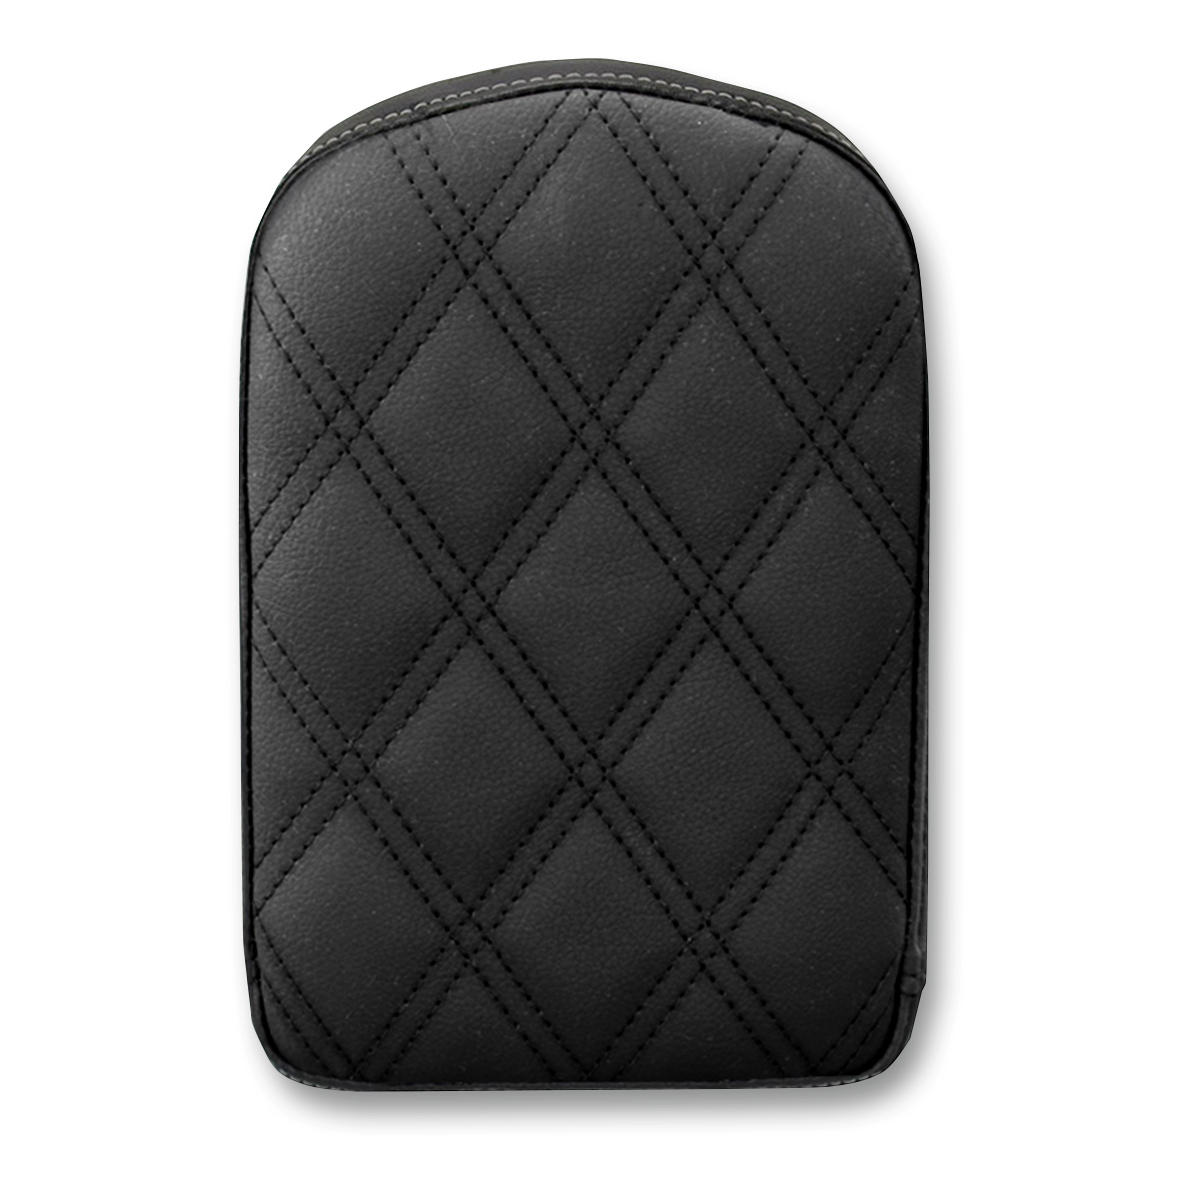 Saddlemen Sissy Bar Pad Black 7″ Diamond Stich